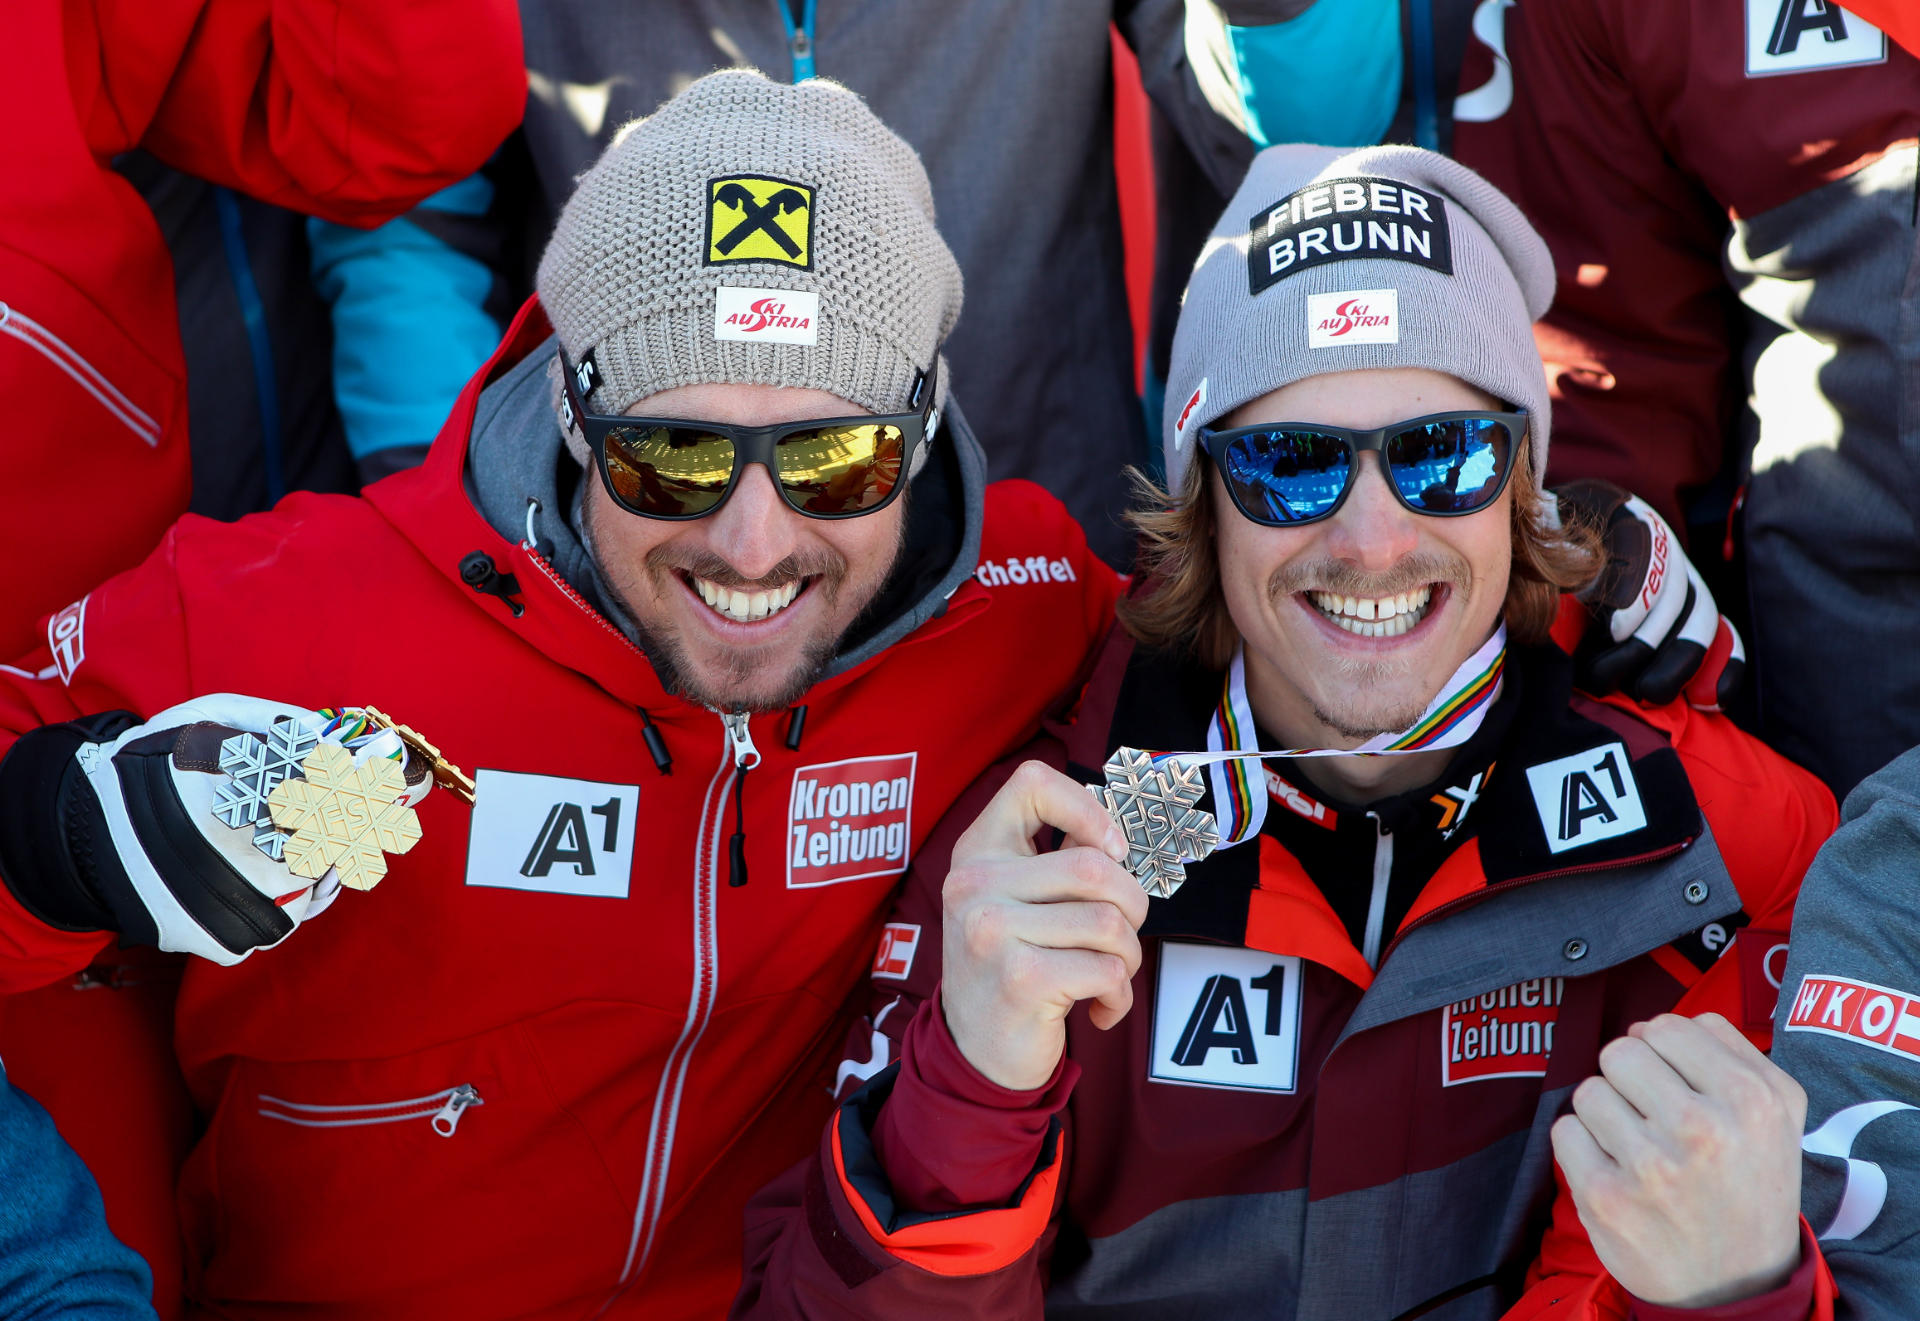 Manuel Feller Slalom Riesenslalom Fieberbrunn